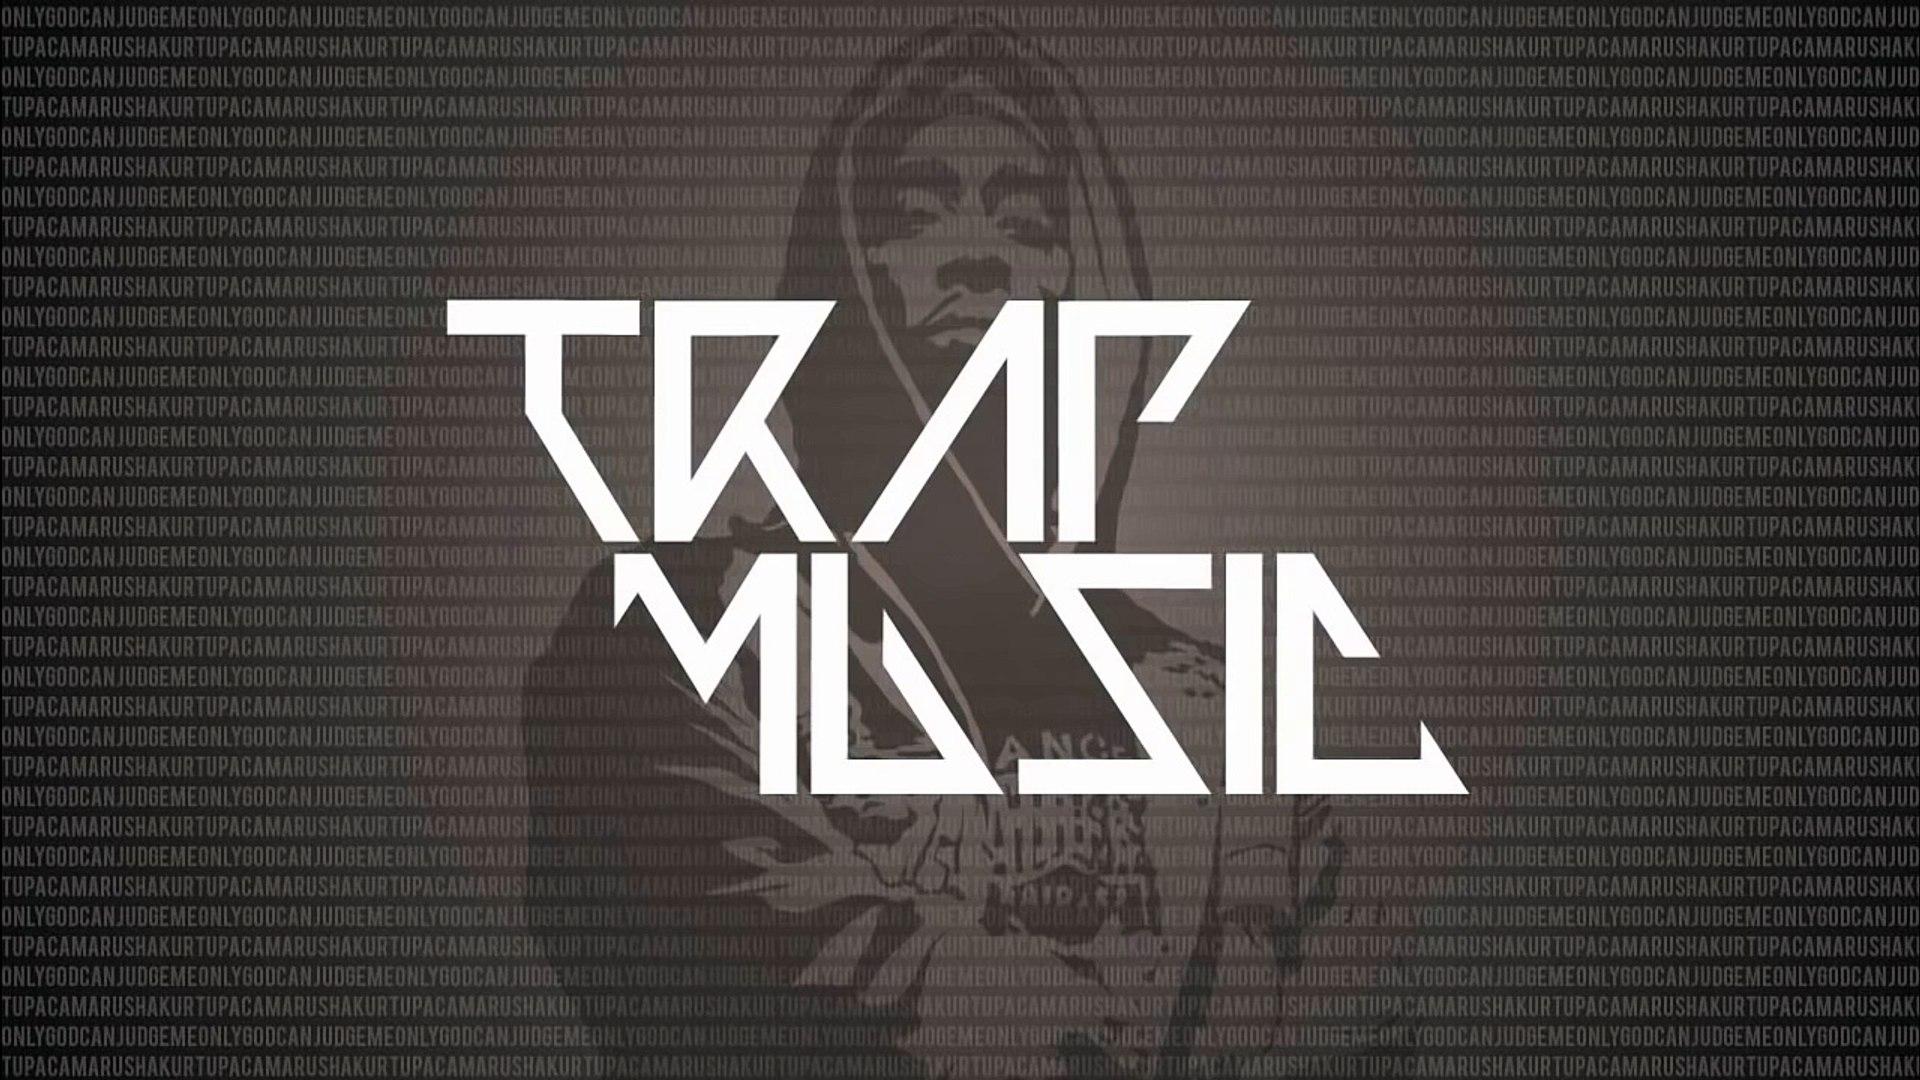 Rick Ross - 100 Black Coffins (Django Unchained Theme) (Meaux Green Trap Remix)